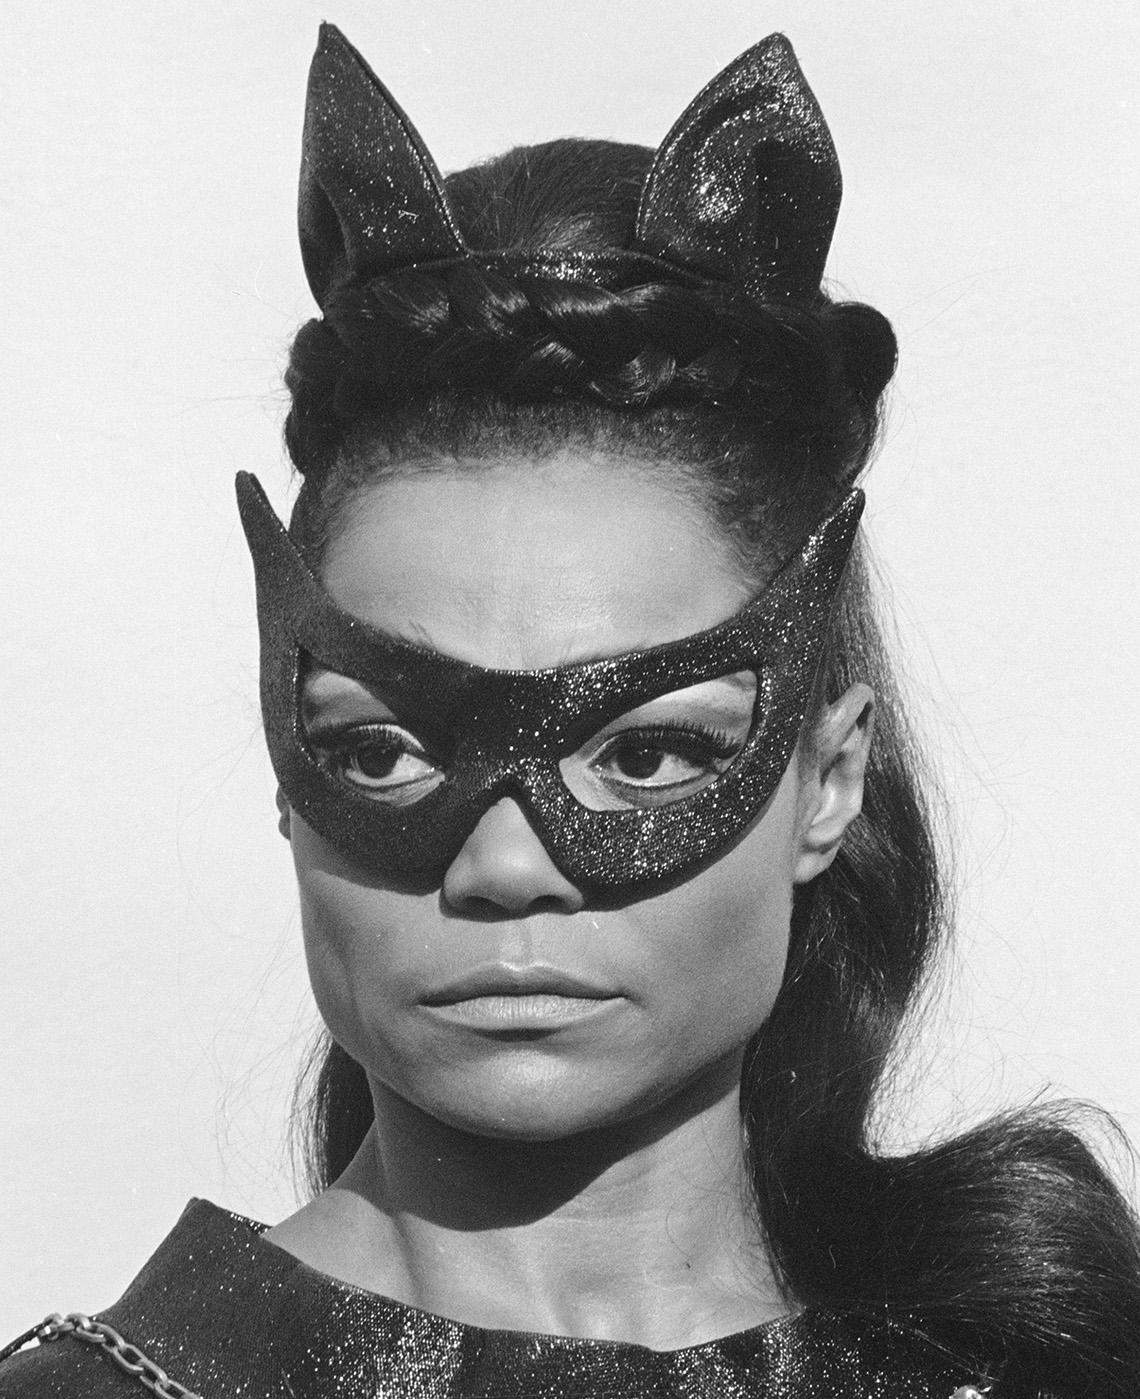 Eartha Kitt stars as The Catwoman in the TV series Batman